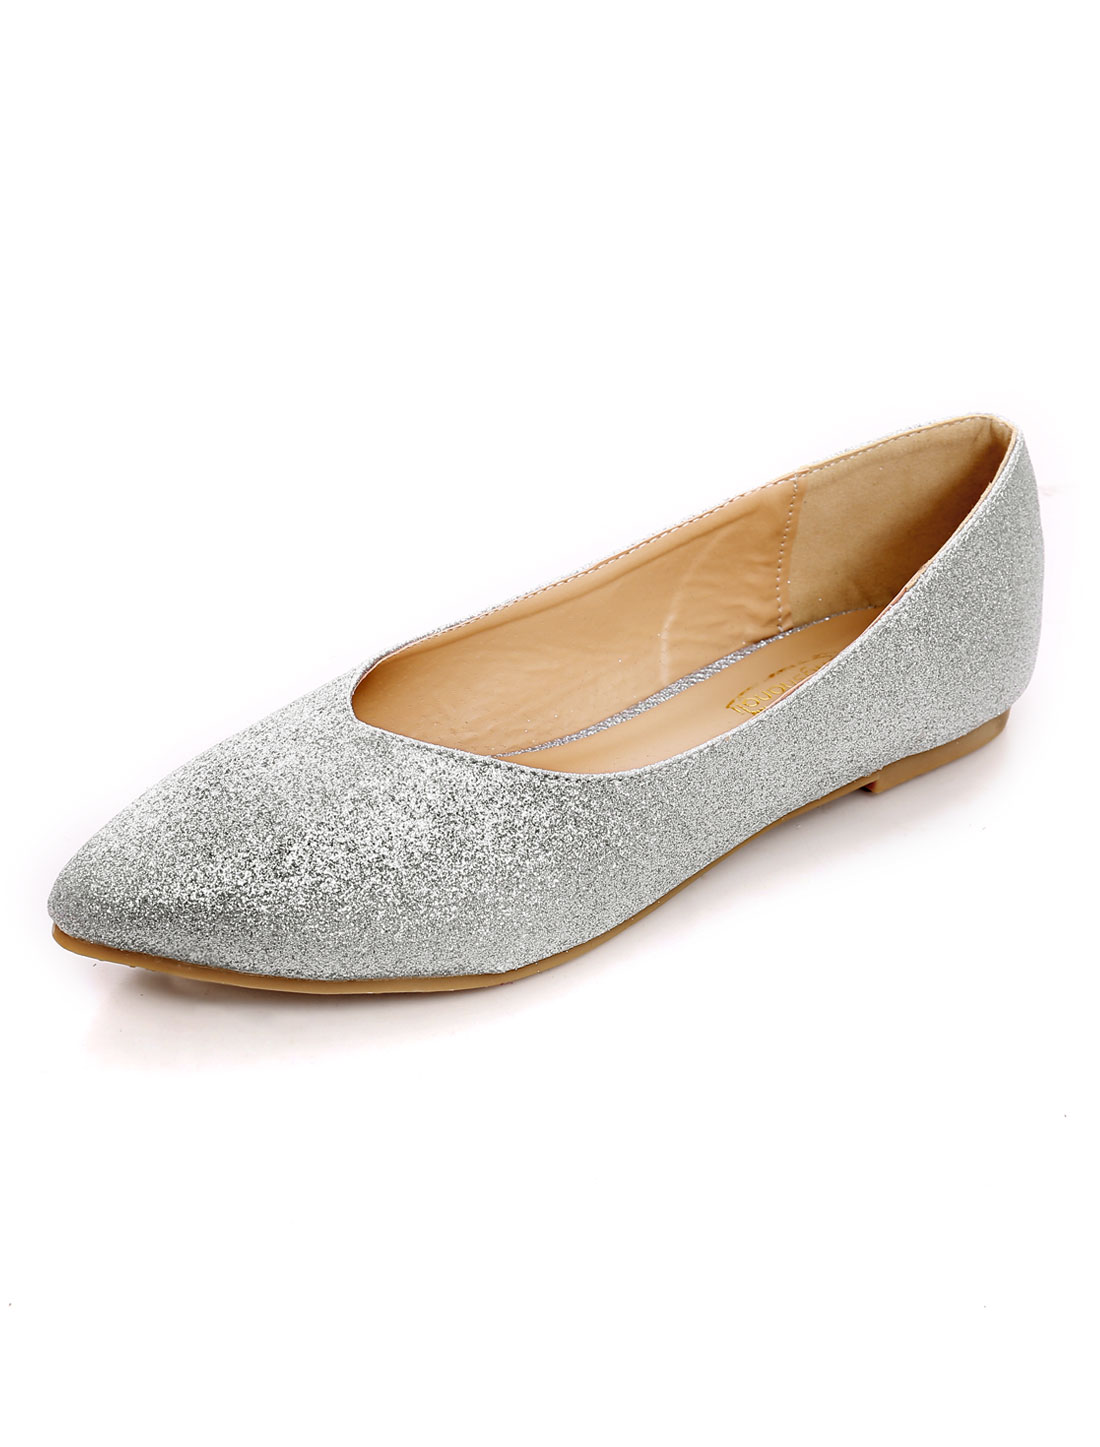 Ladies Slip On Shiny Decor Flats Shoes Silver Tone US 8